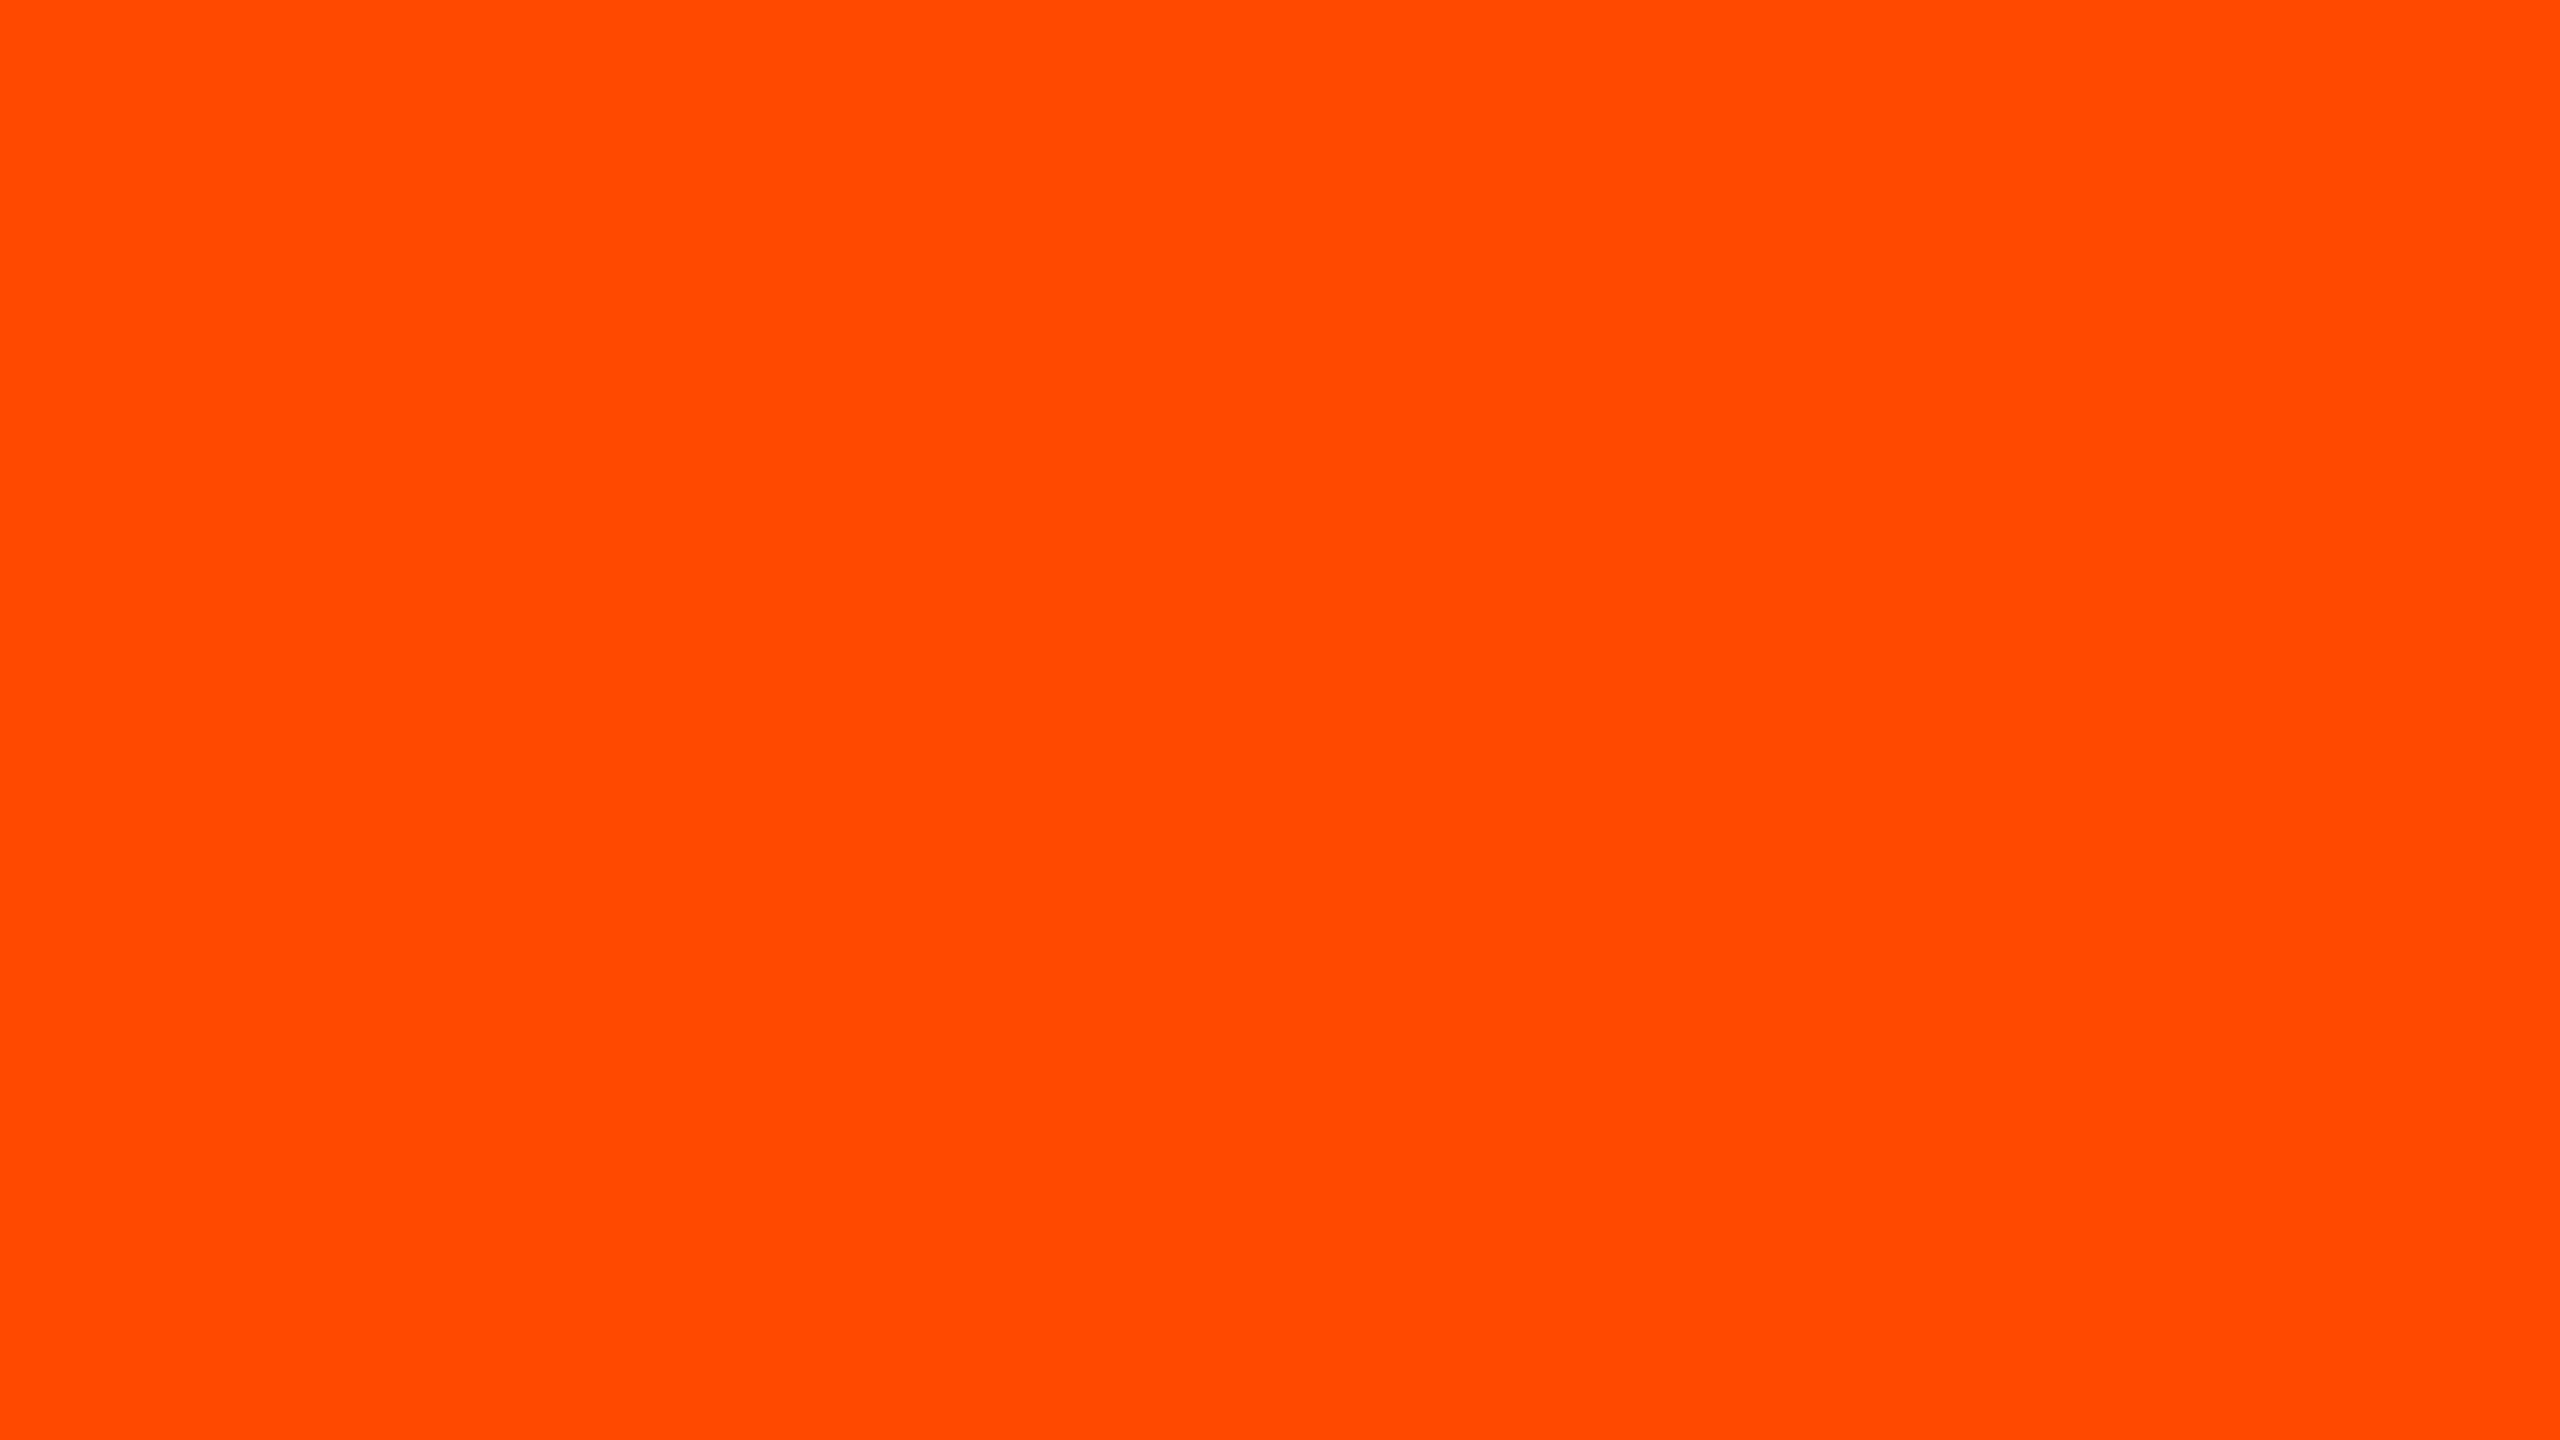 Dark orange backgrounds images amp pictures becuo